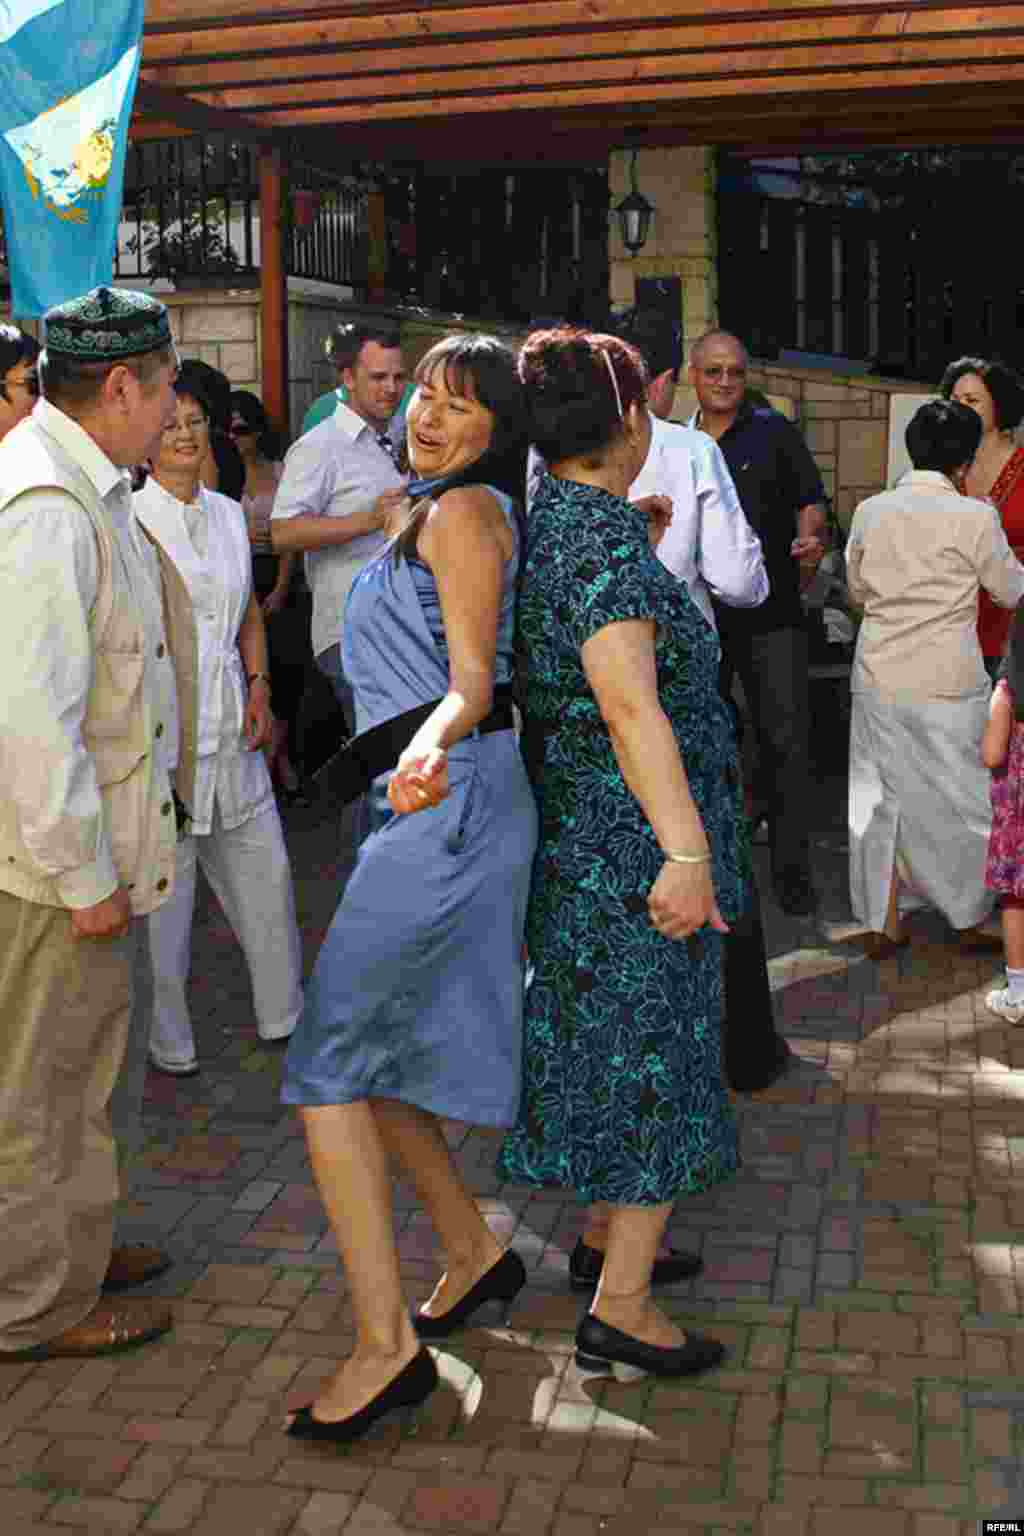 Бәйге: Кім жеңеді екен? - Kazakhstan-Kazakh Service Web Party, Arabic Dance